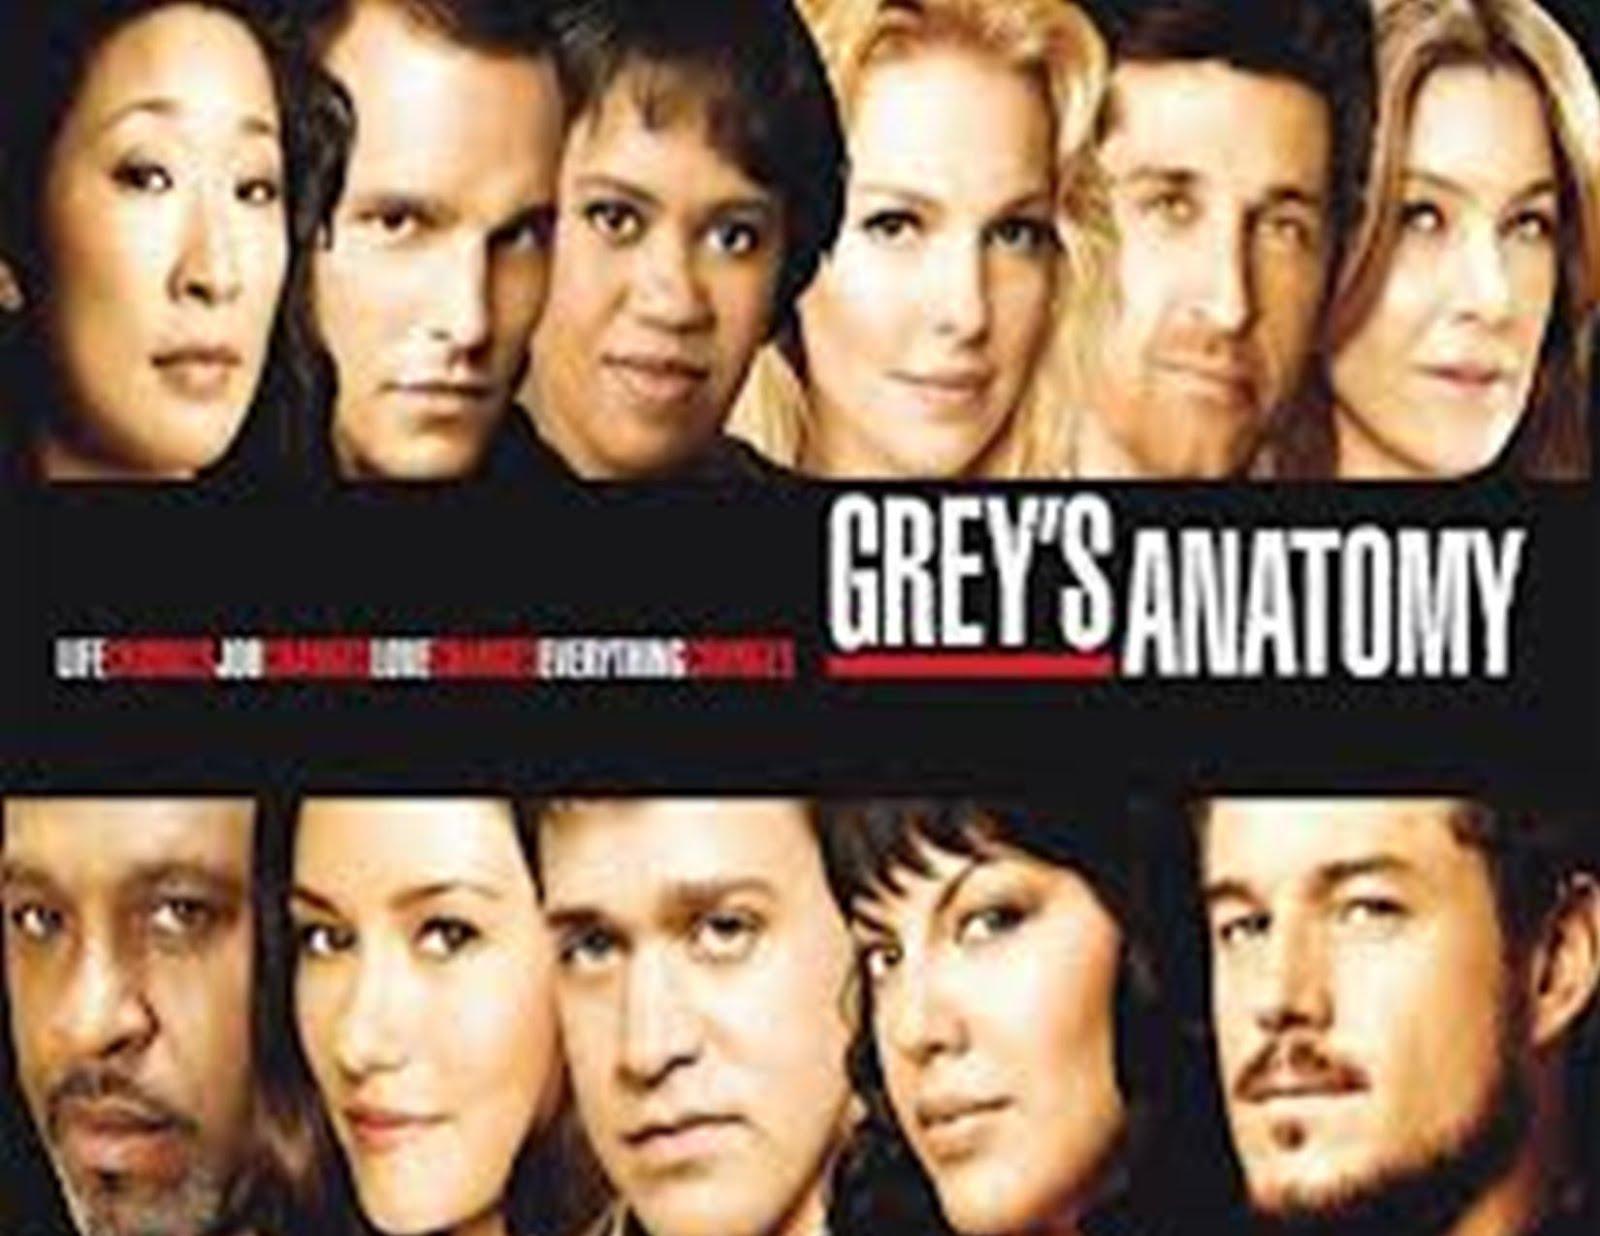 You Watch Online Free Watch Greys Anatomy Season 9 Episode 6 S09e6